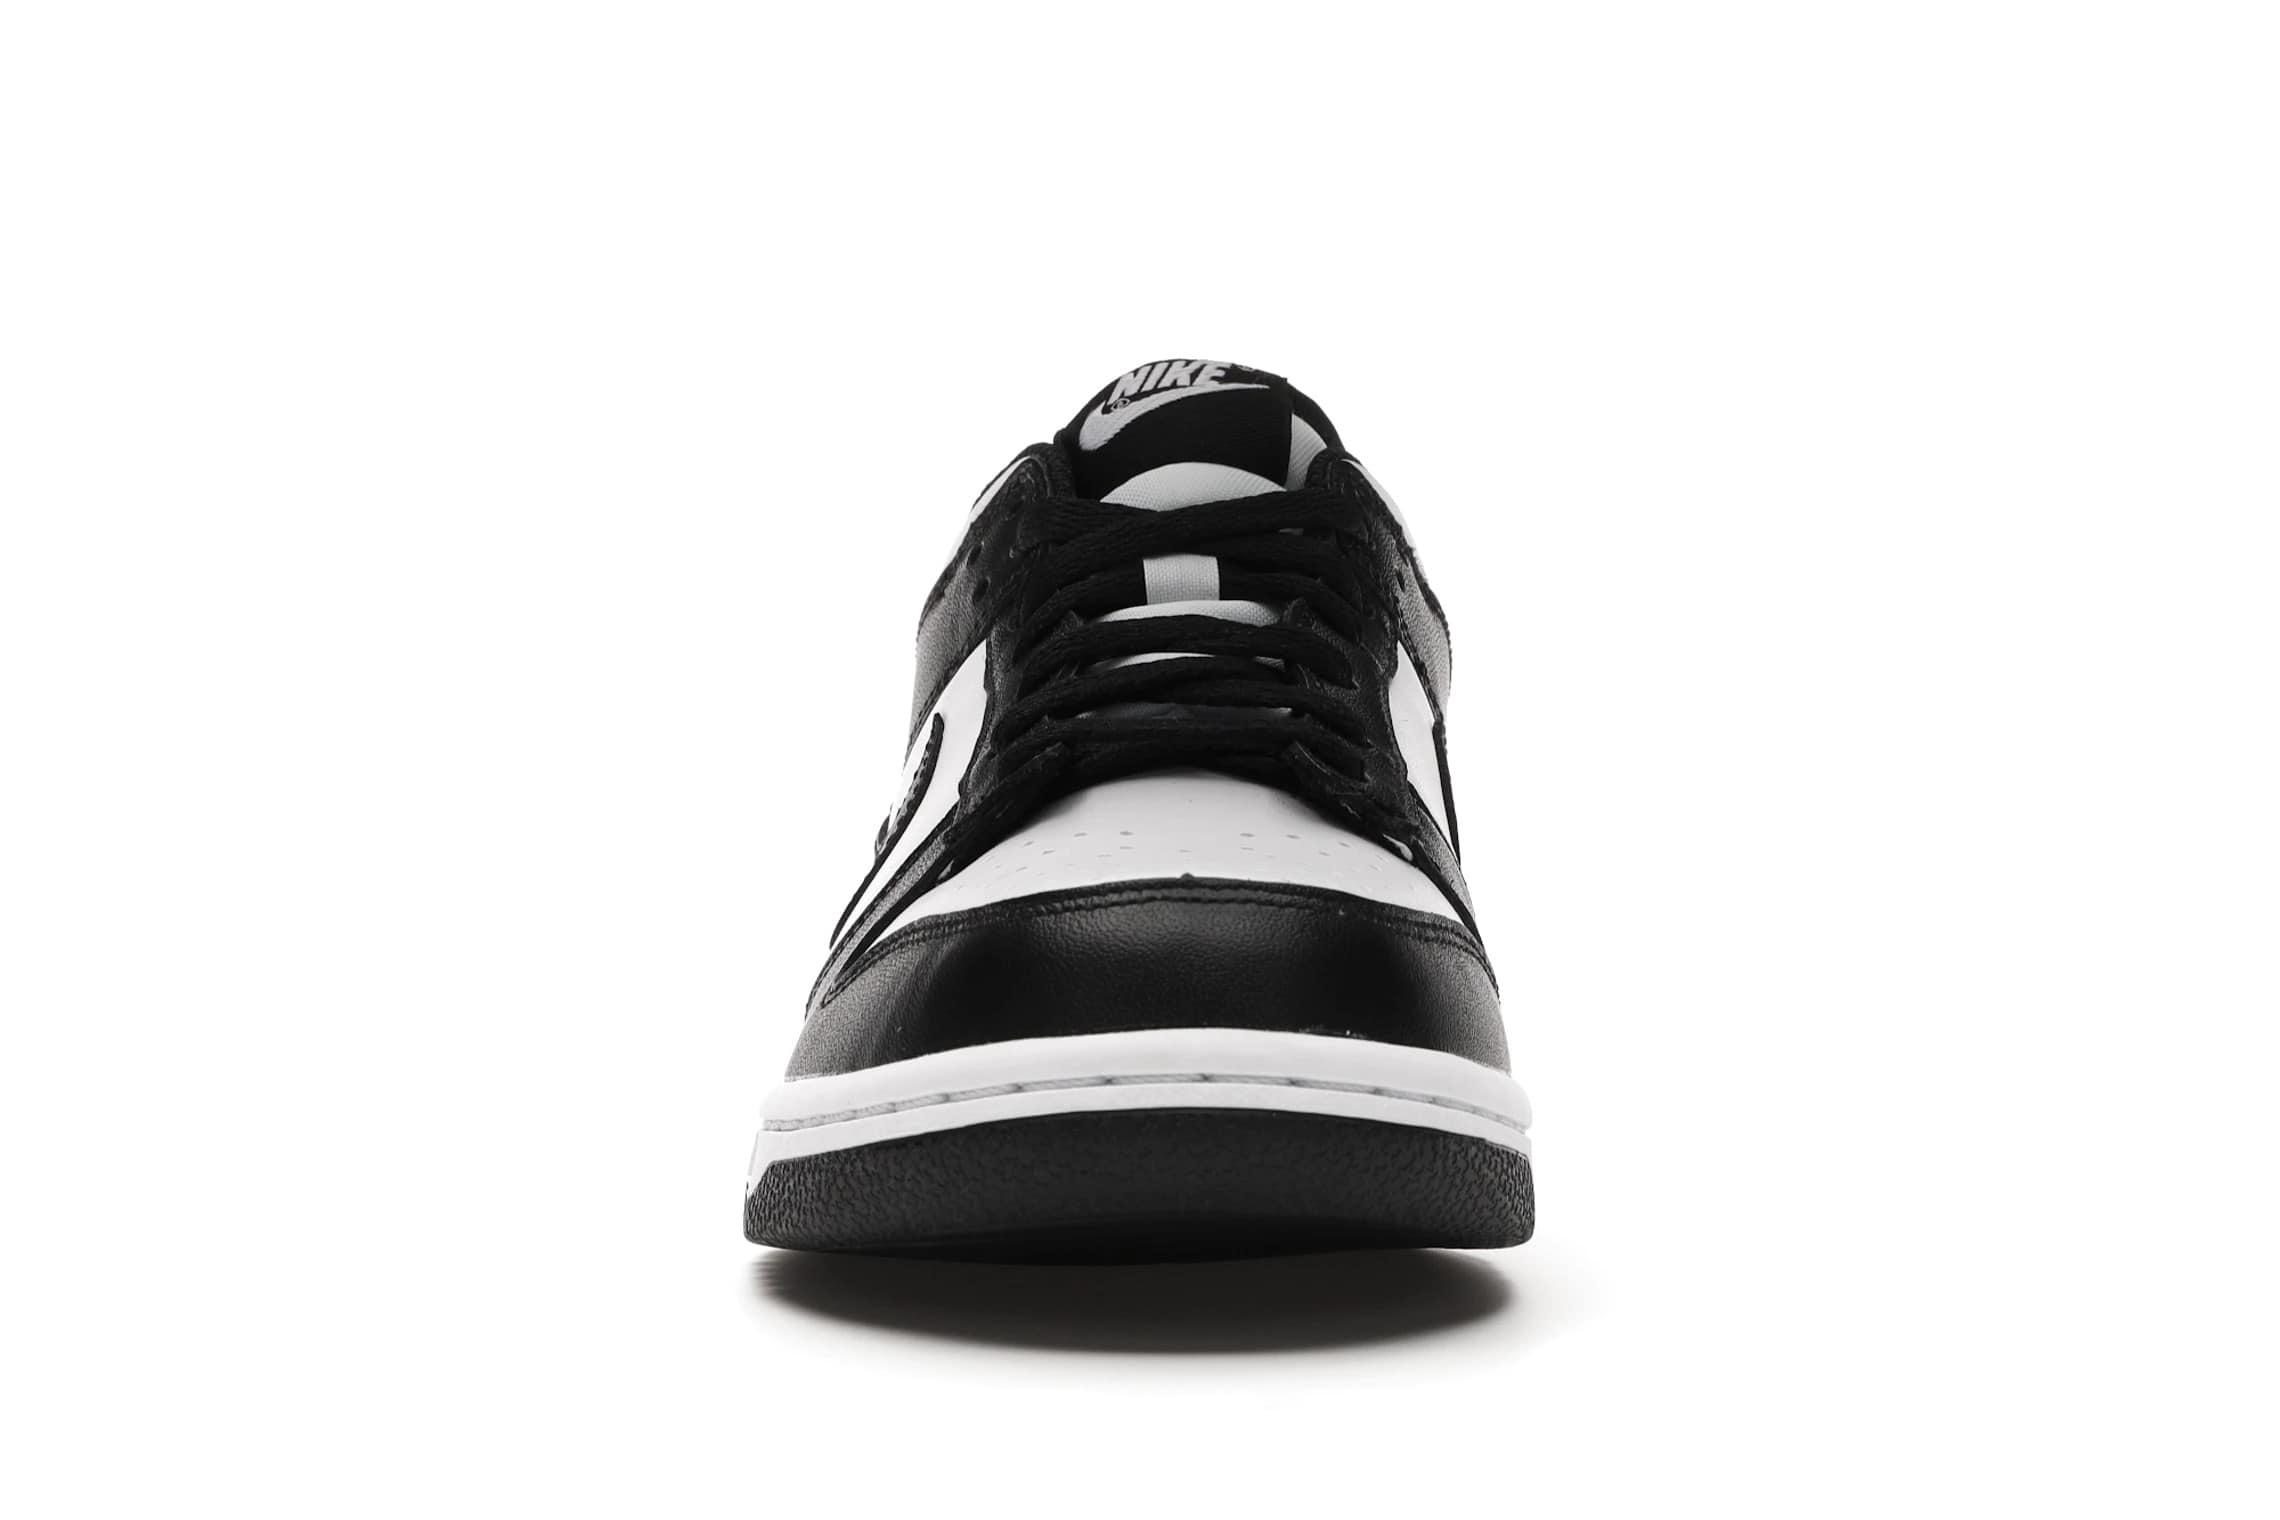 slide 2 - Dunk Low Retro White Black (GS)